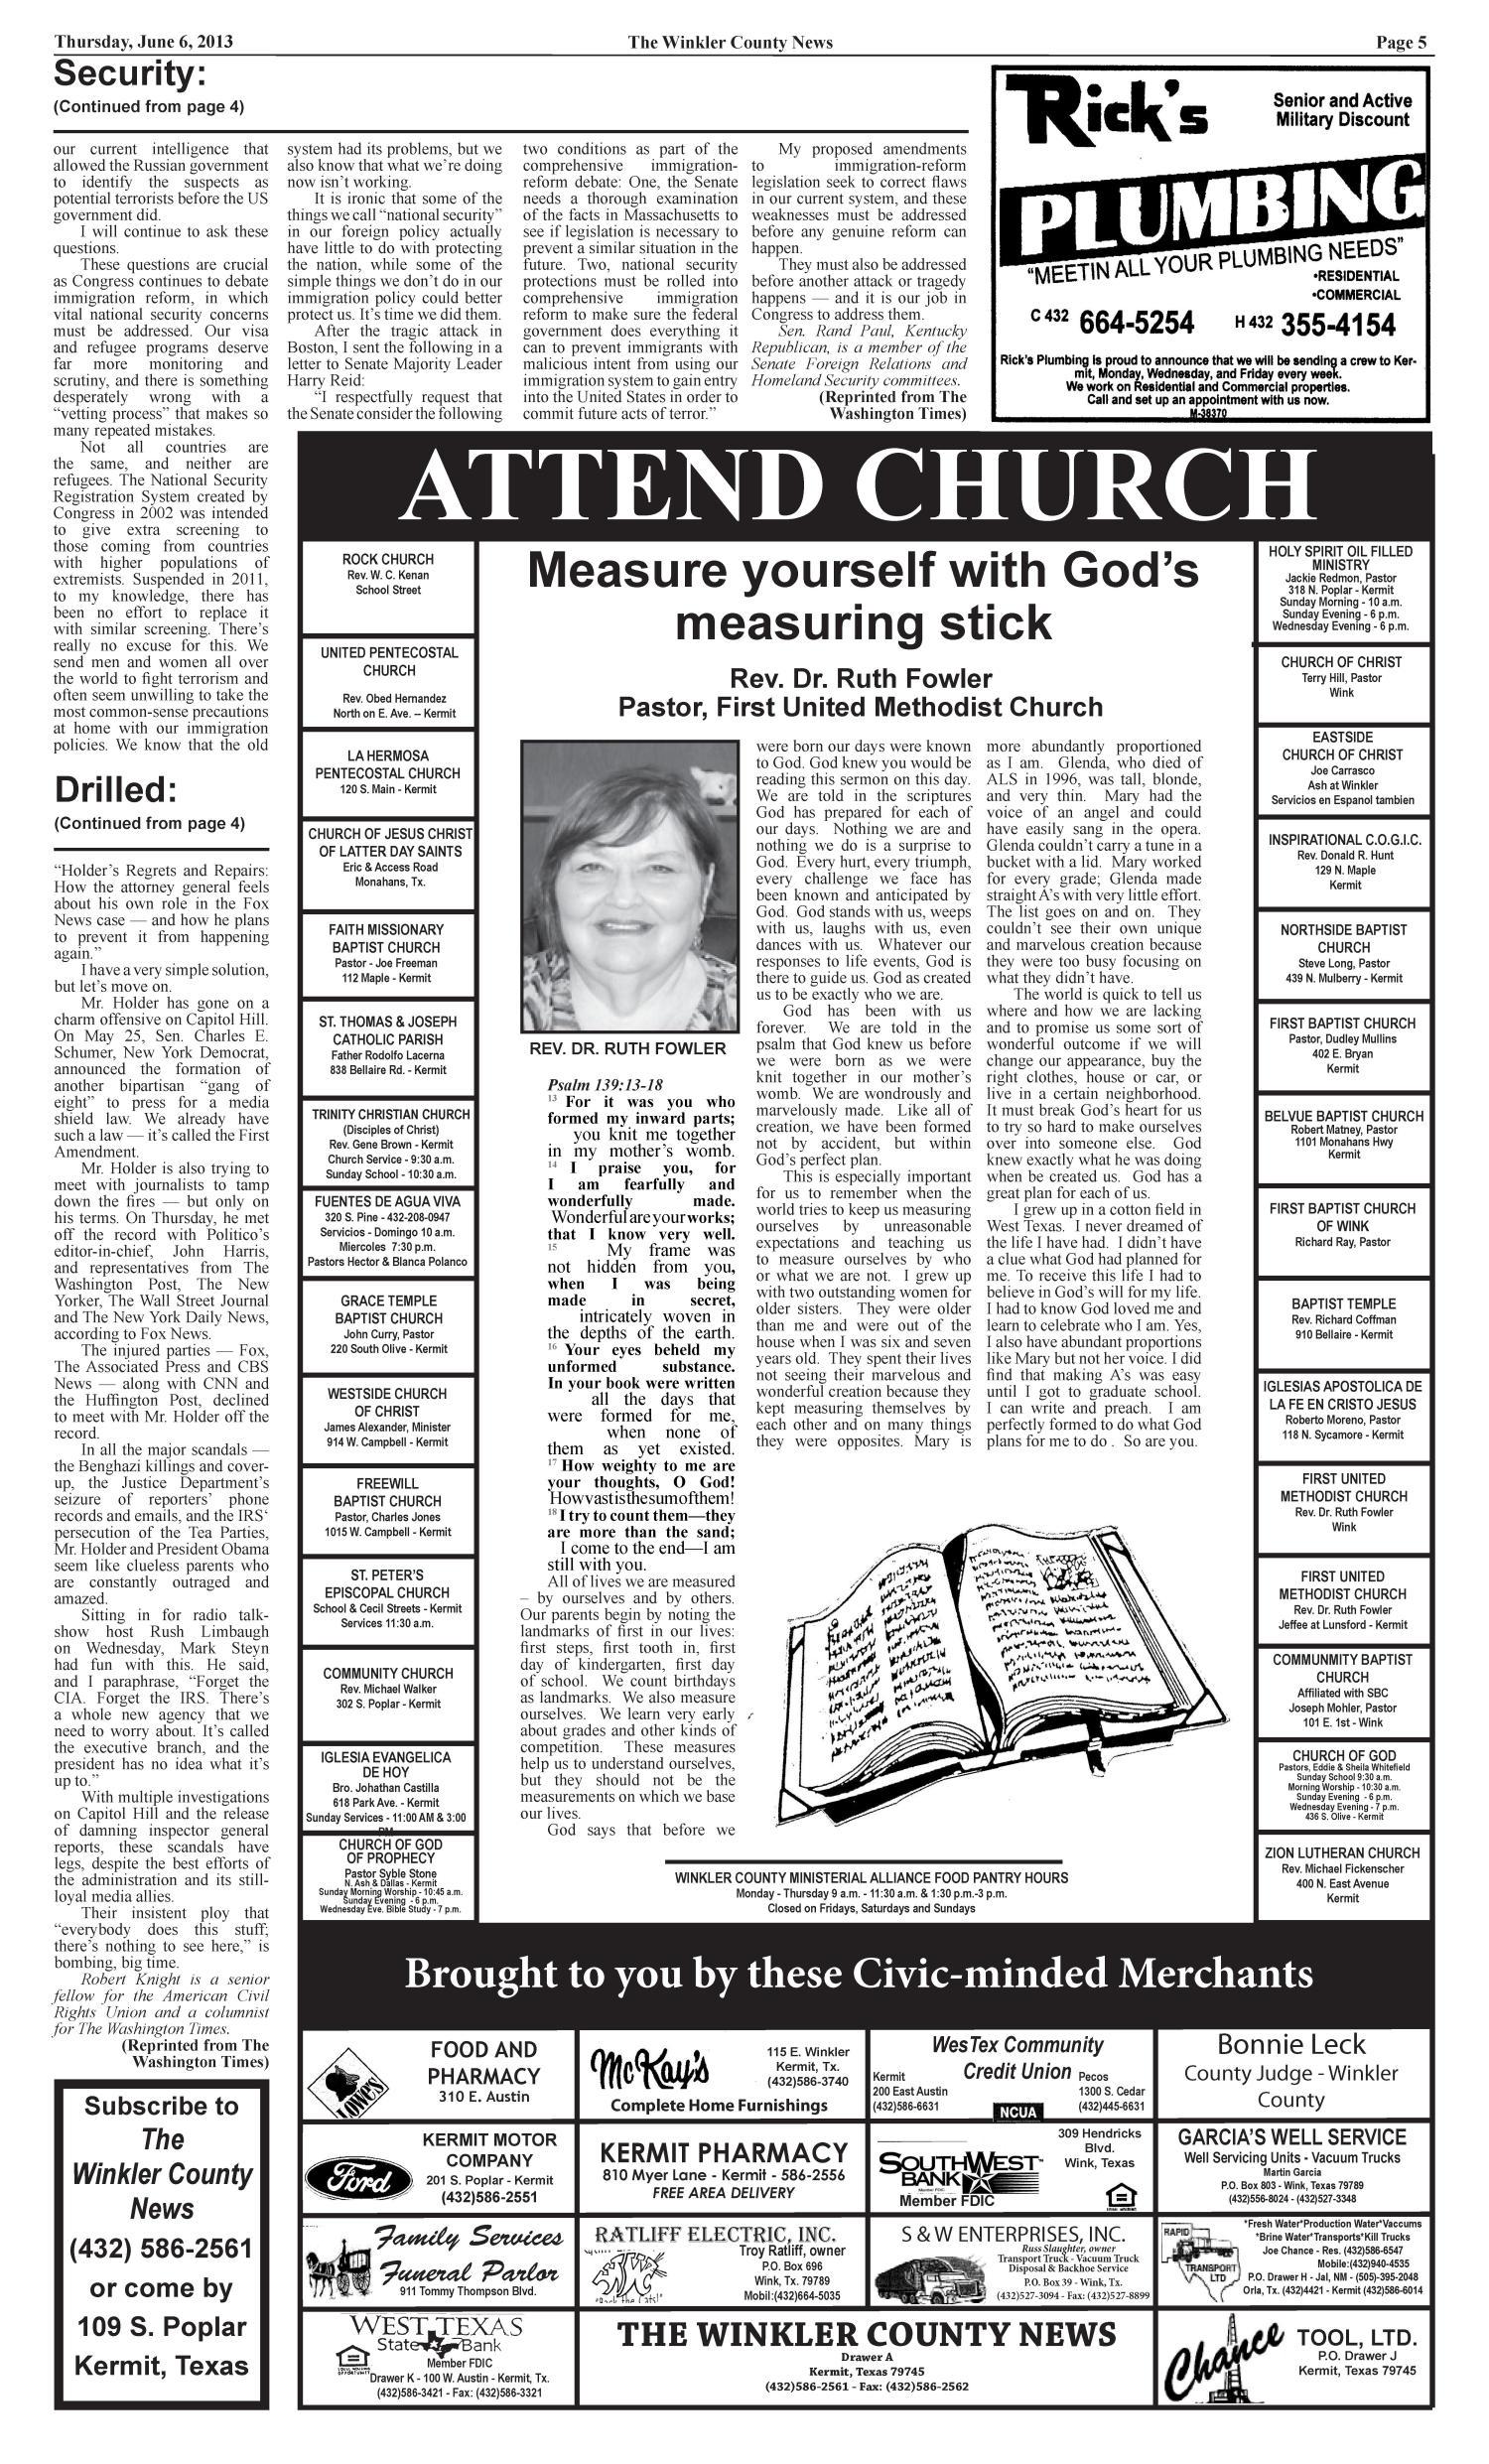 The Winkler County News (Kermit, Tex ), Vol  78, No  22, Ed